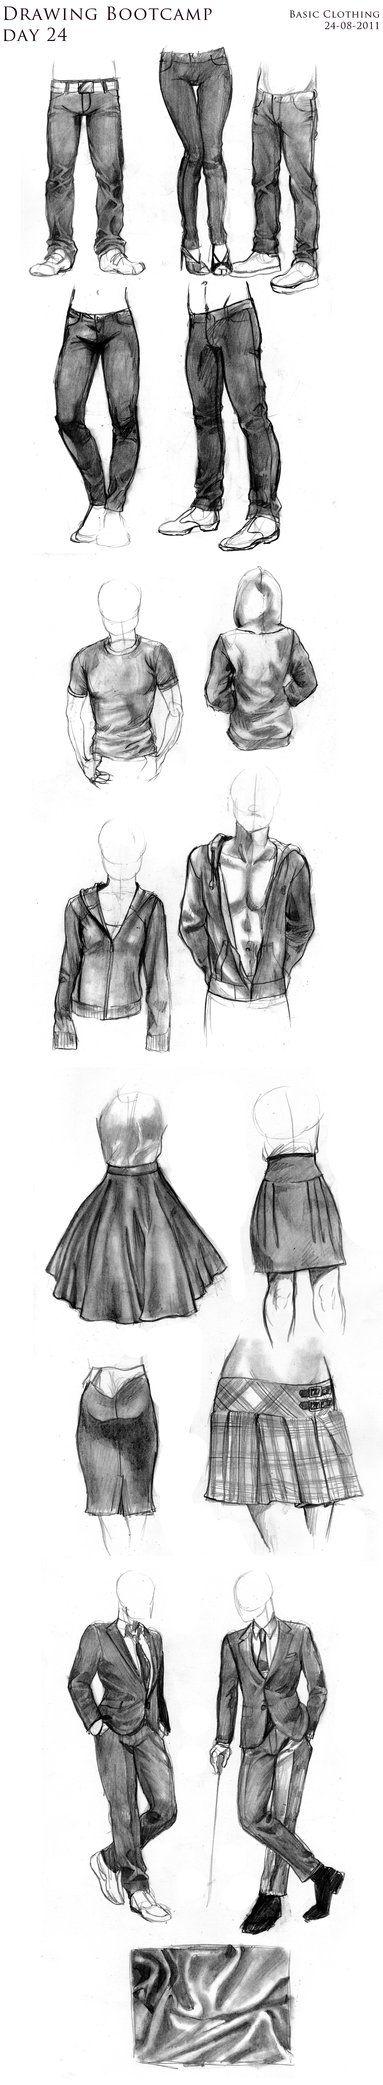 Weird Clothes Drawing 4